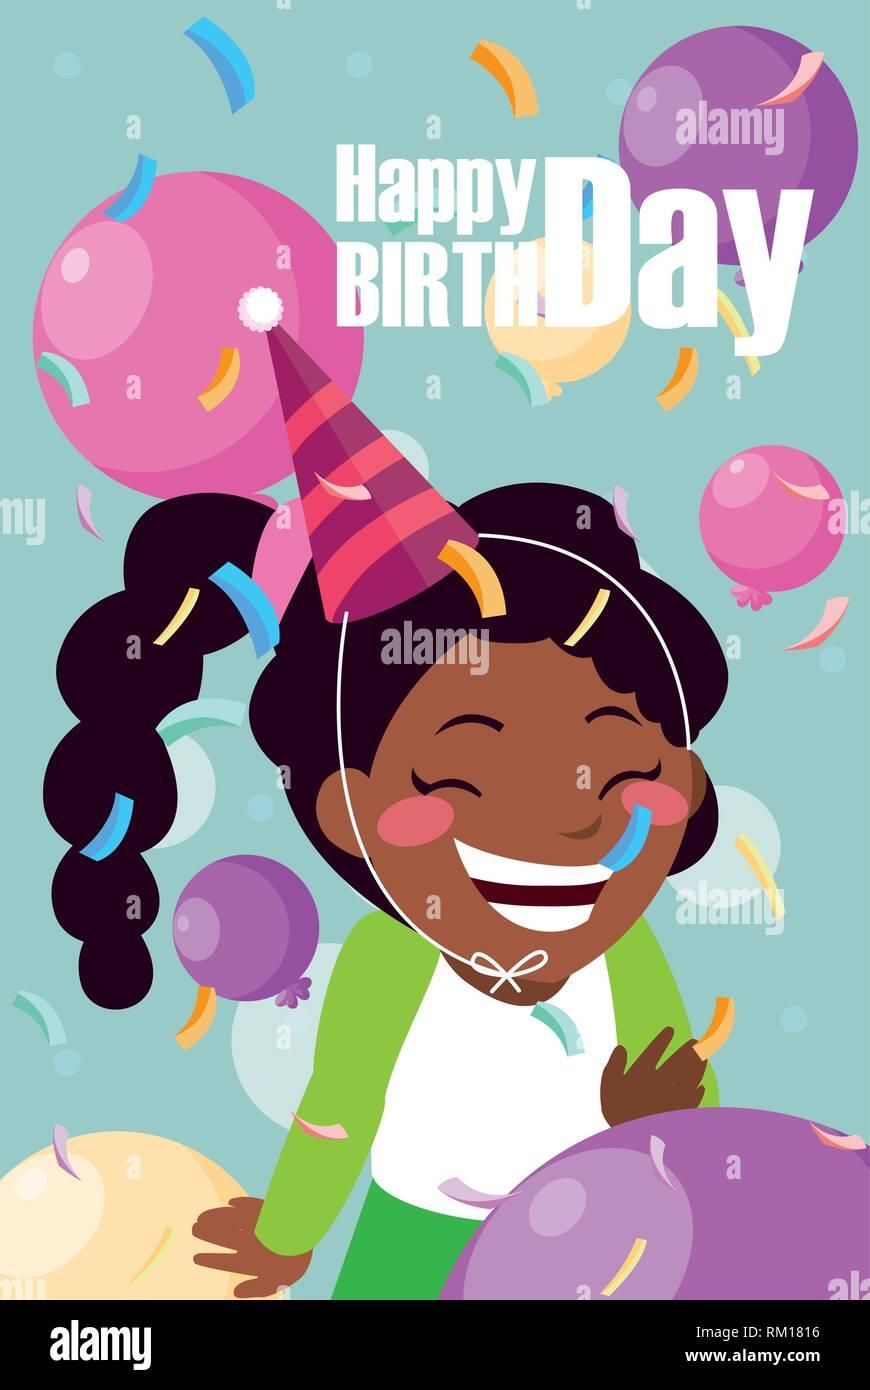 Birthday Card With Little Black Girl Celebrating Vector Illustration